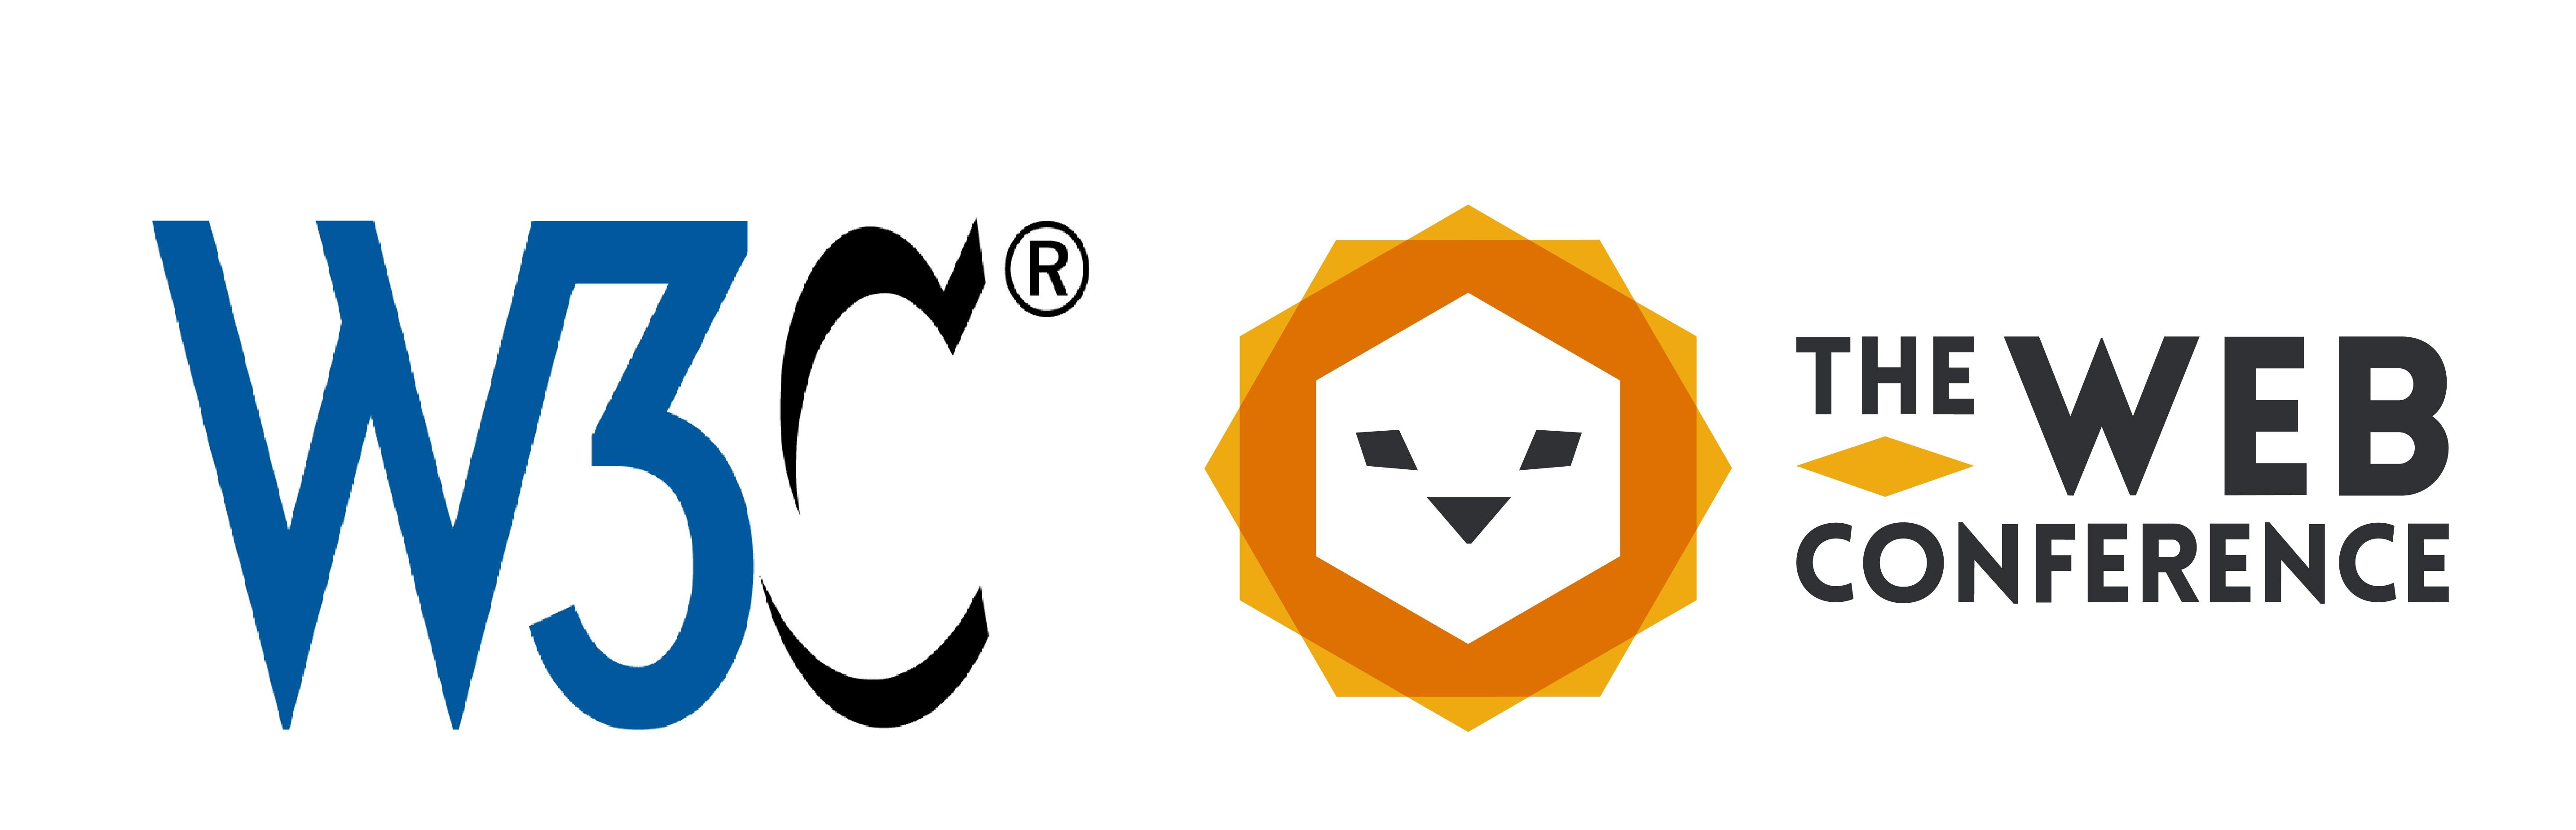 W3C & WebConf2018